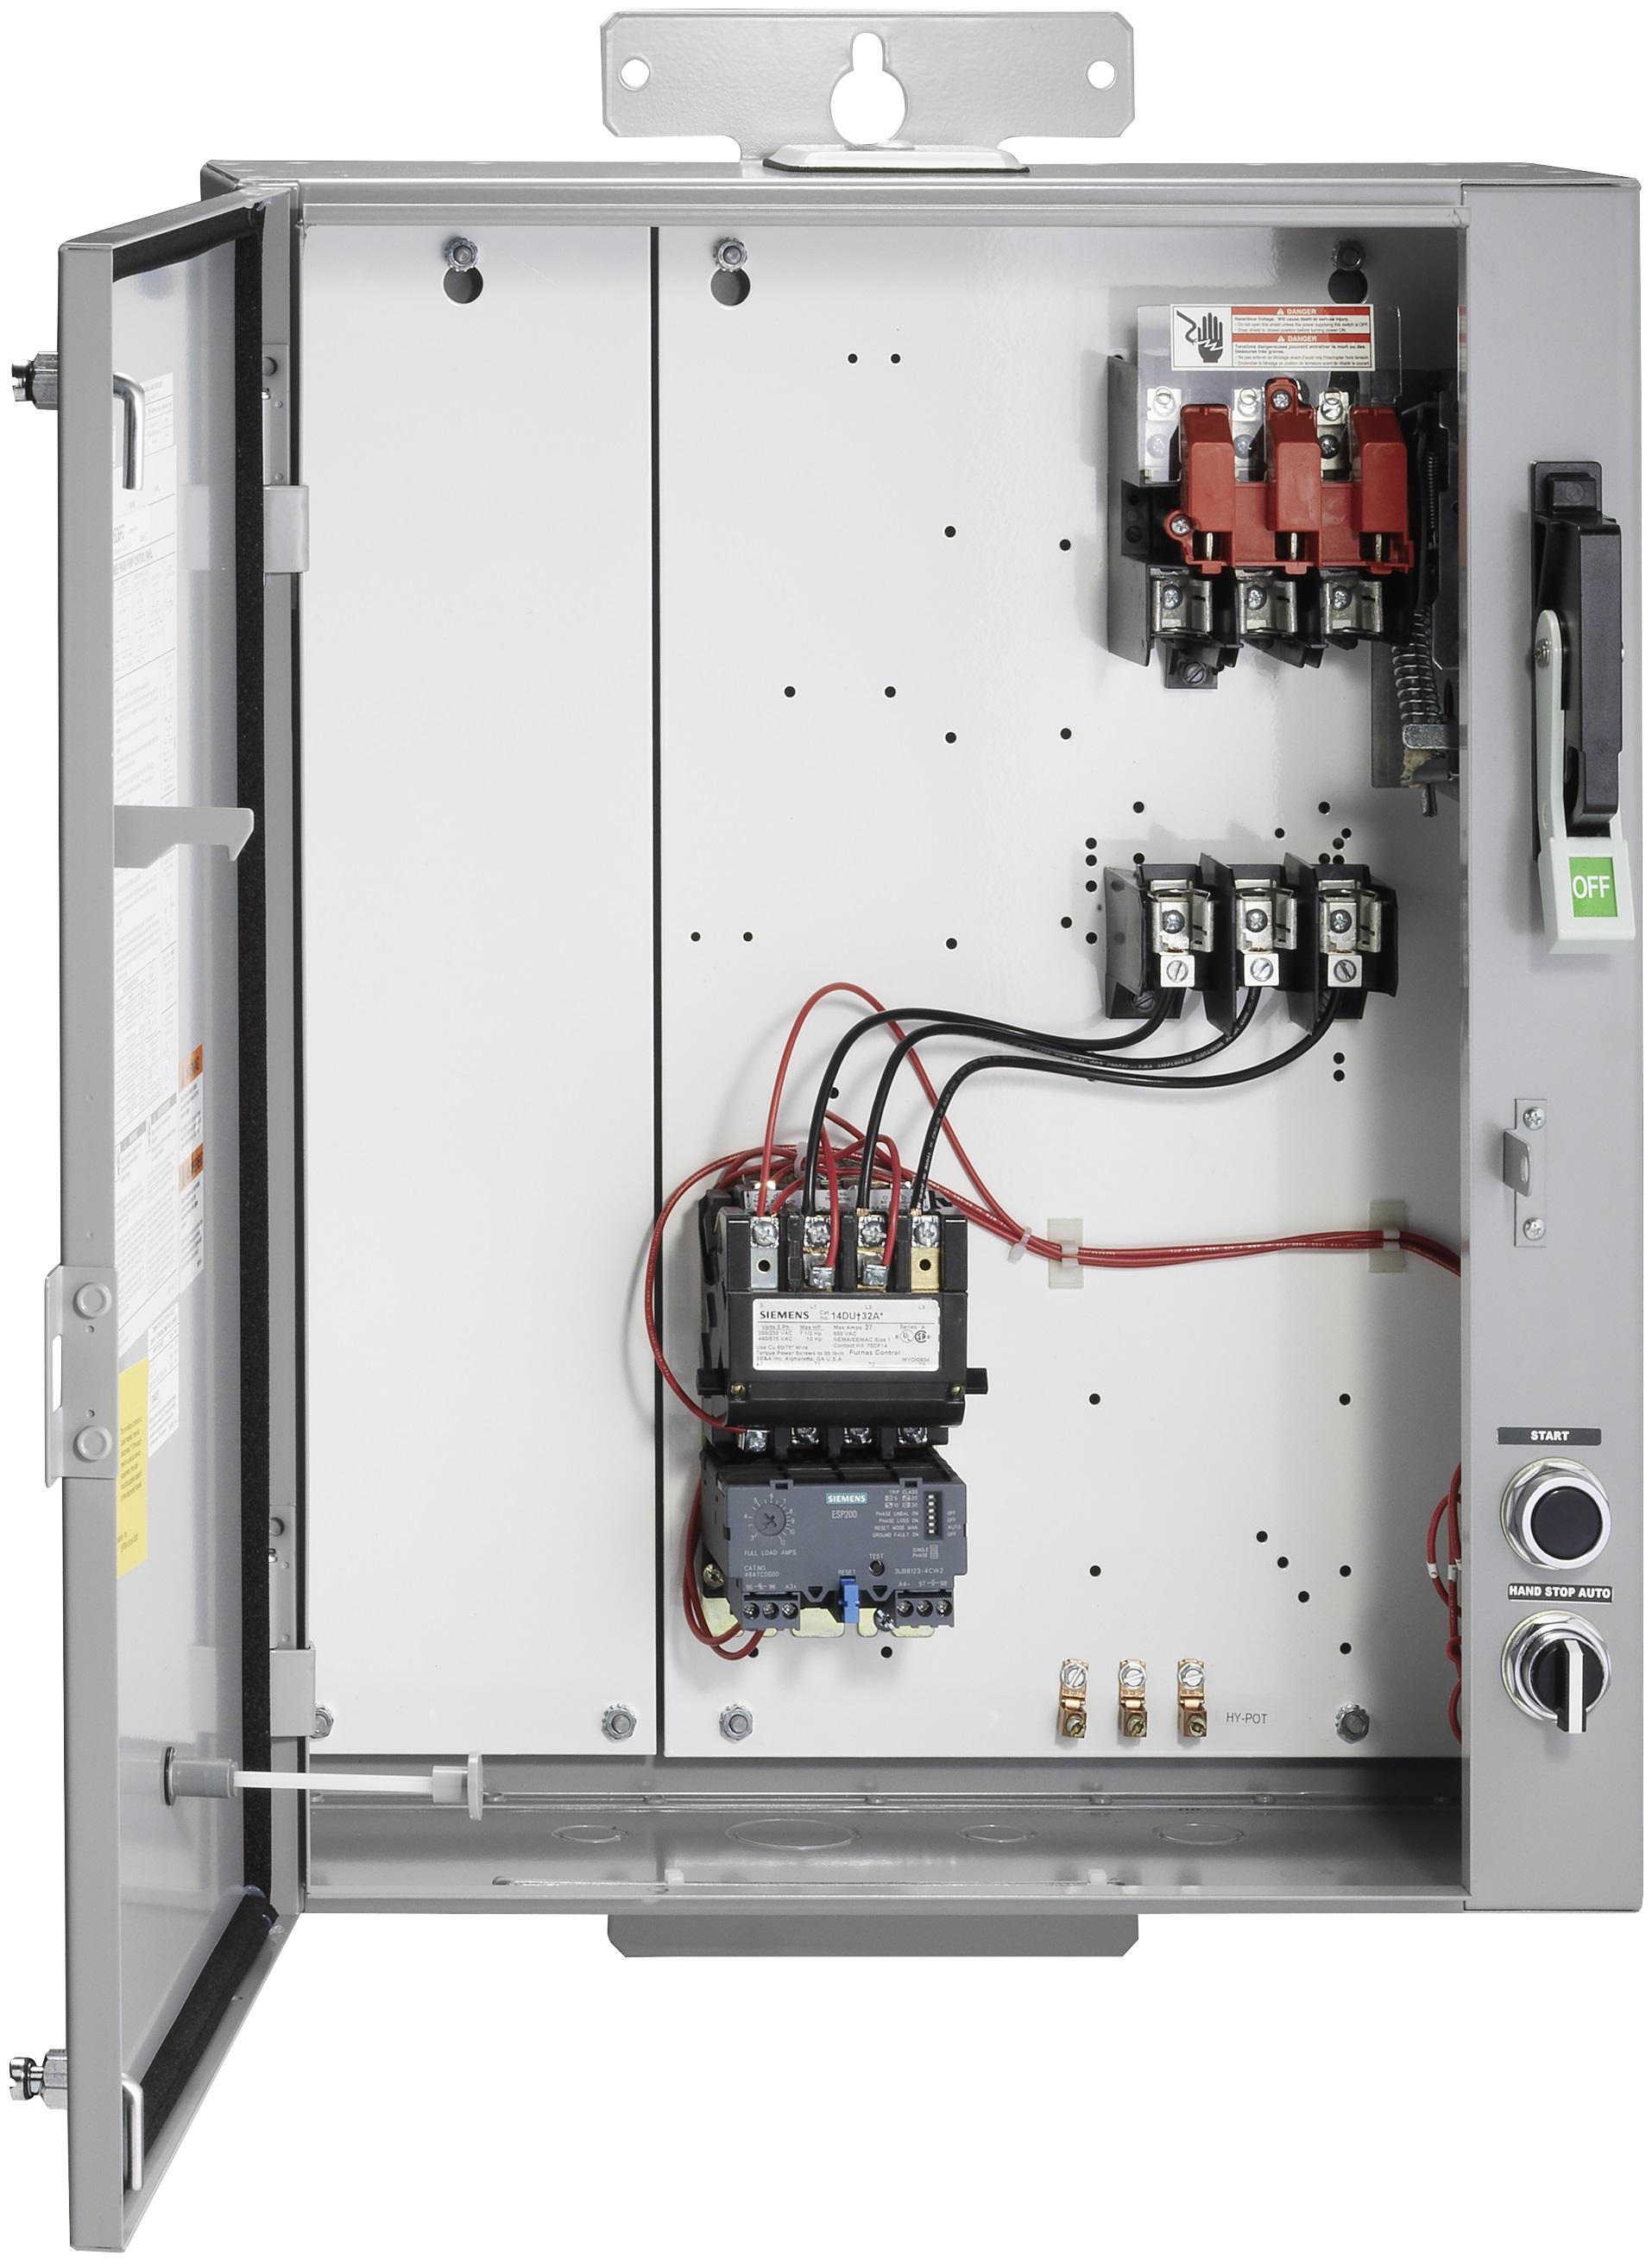 Siemens Furnas 87hug6pg Pump Combination Control Panels